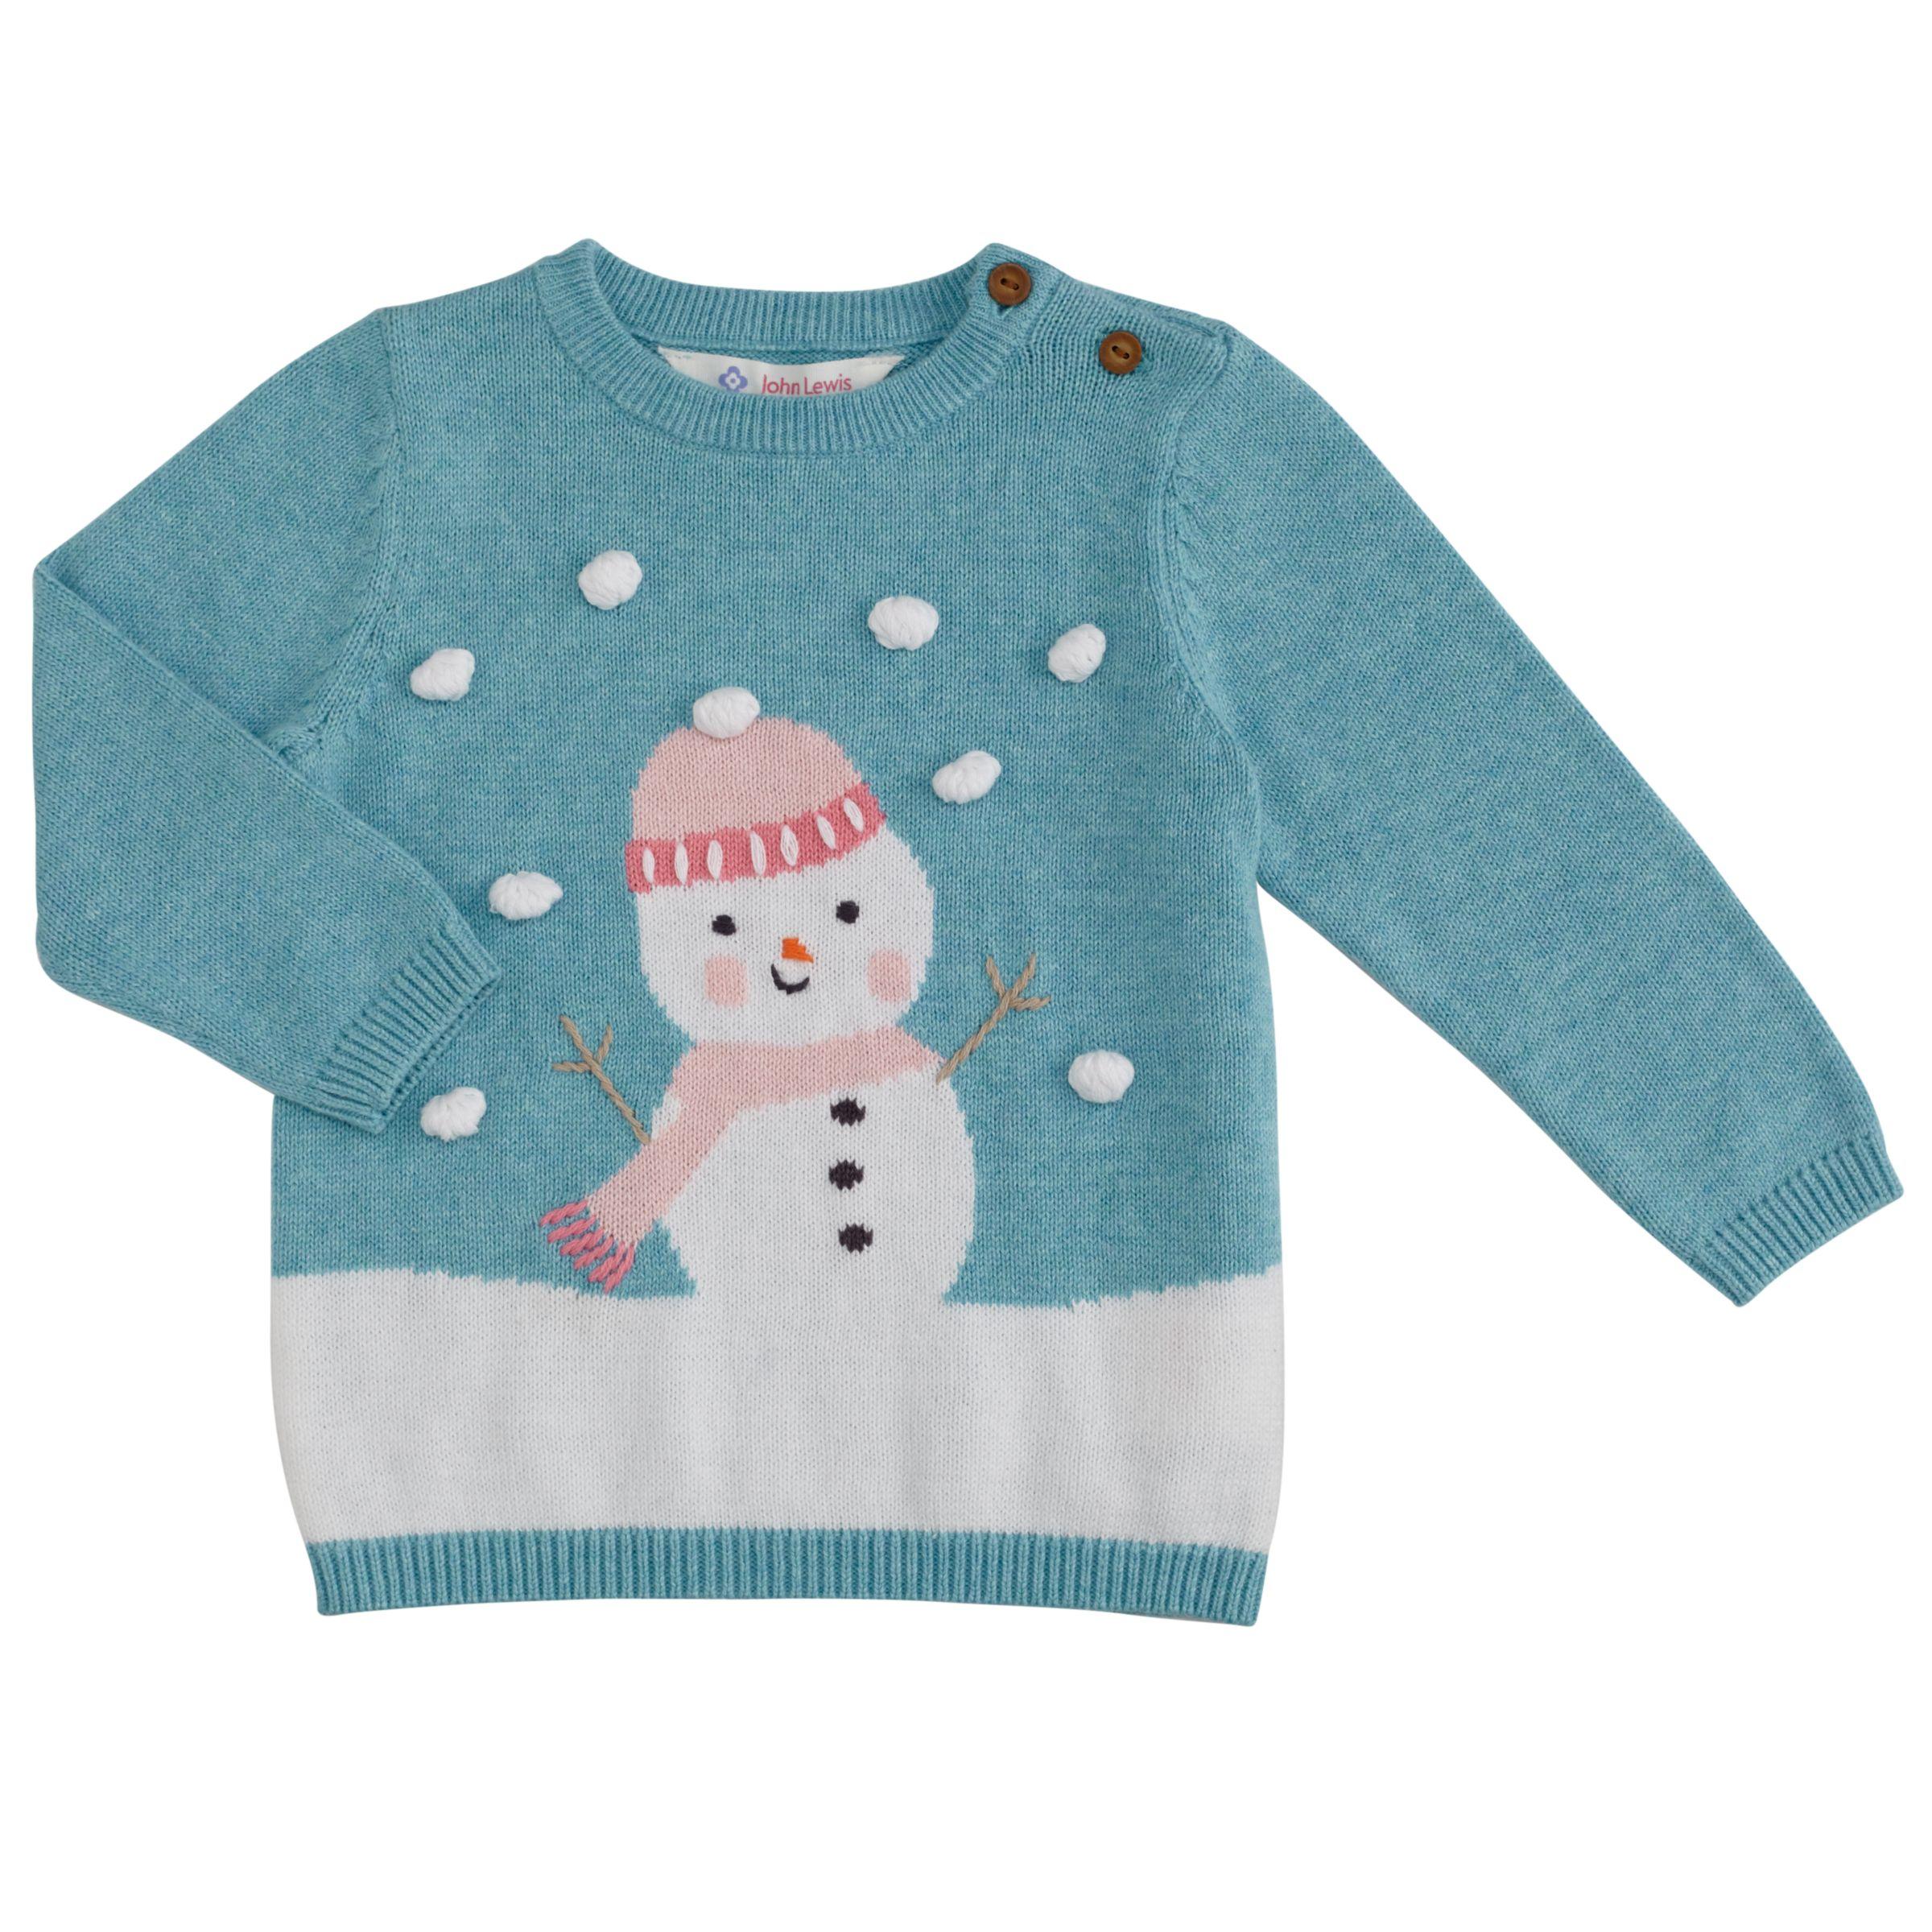 John Lewis Snowman Knitting Pattern : Buy John Lewis Baby 3D Snowman Christmas Jumper, Blue John Lewis